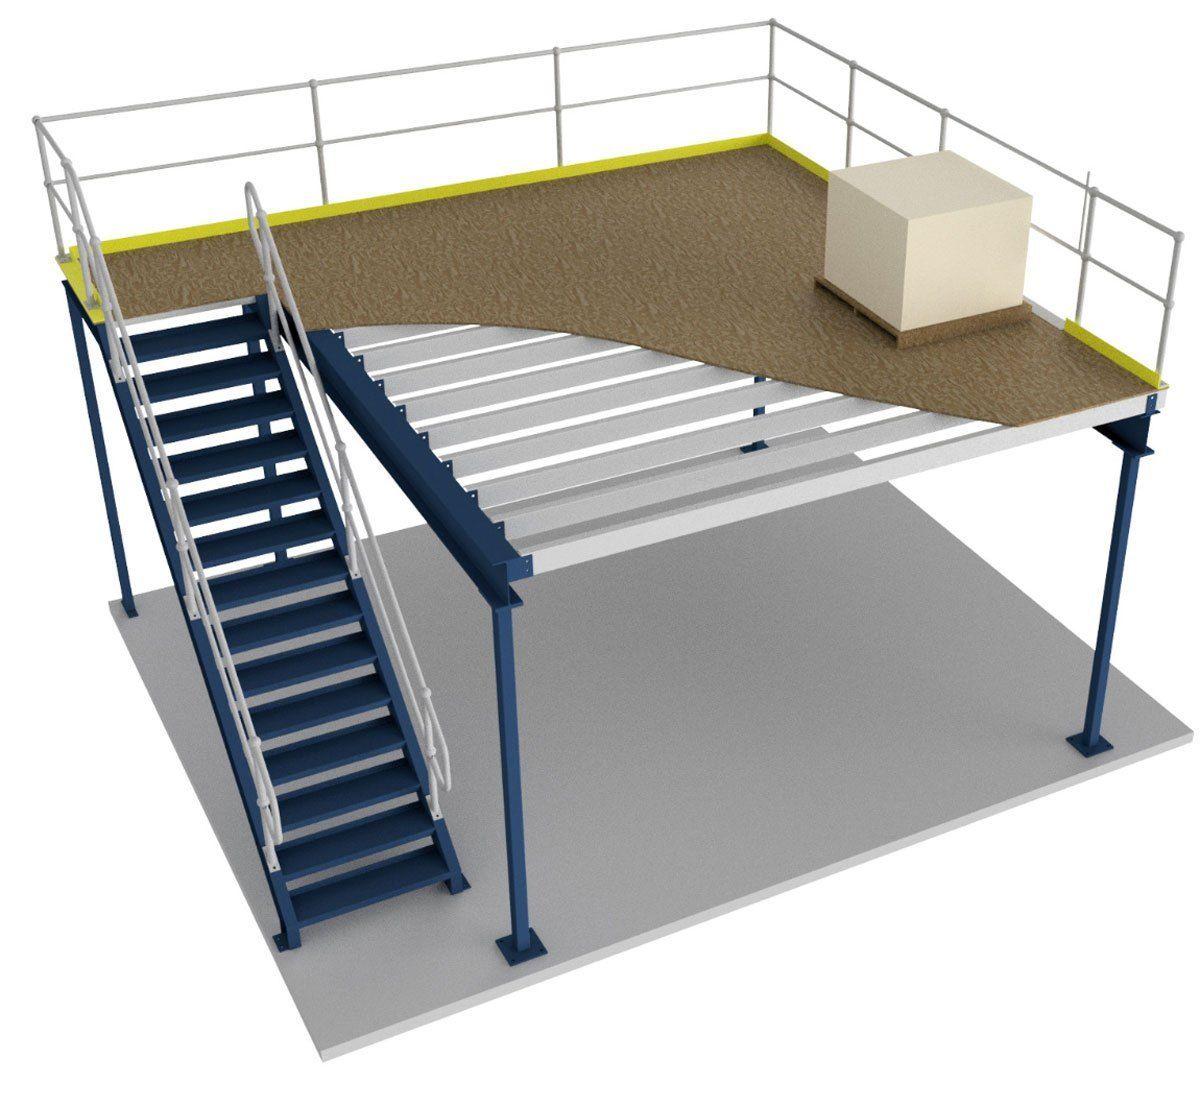 Free-Standing Mezzanines from RackingDIRECT